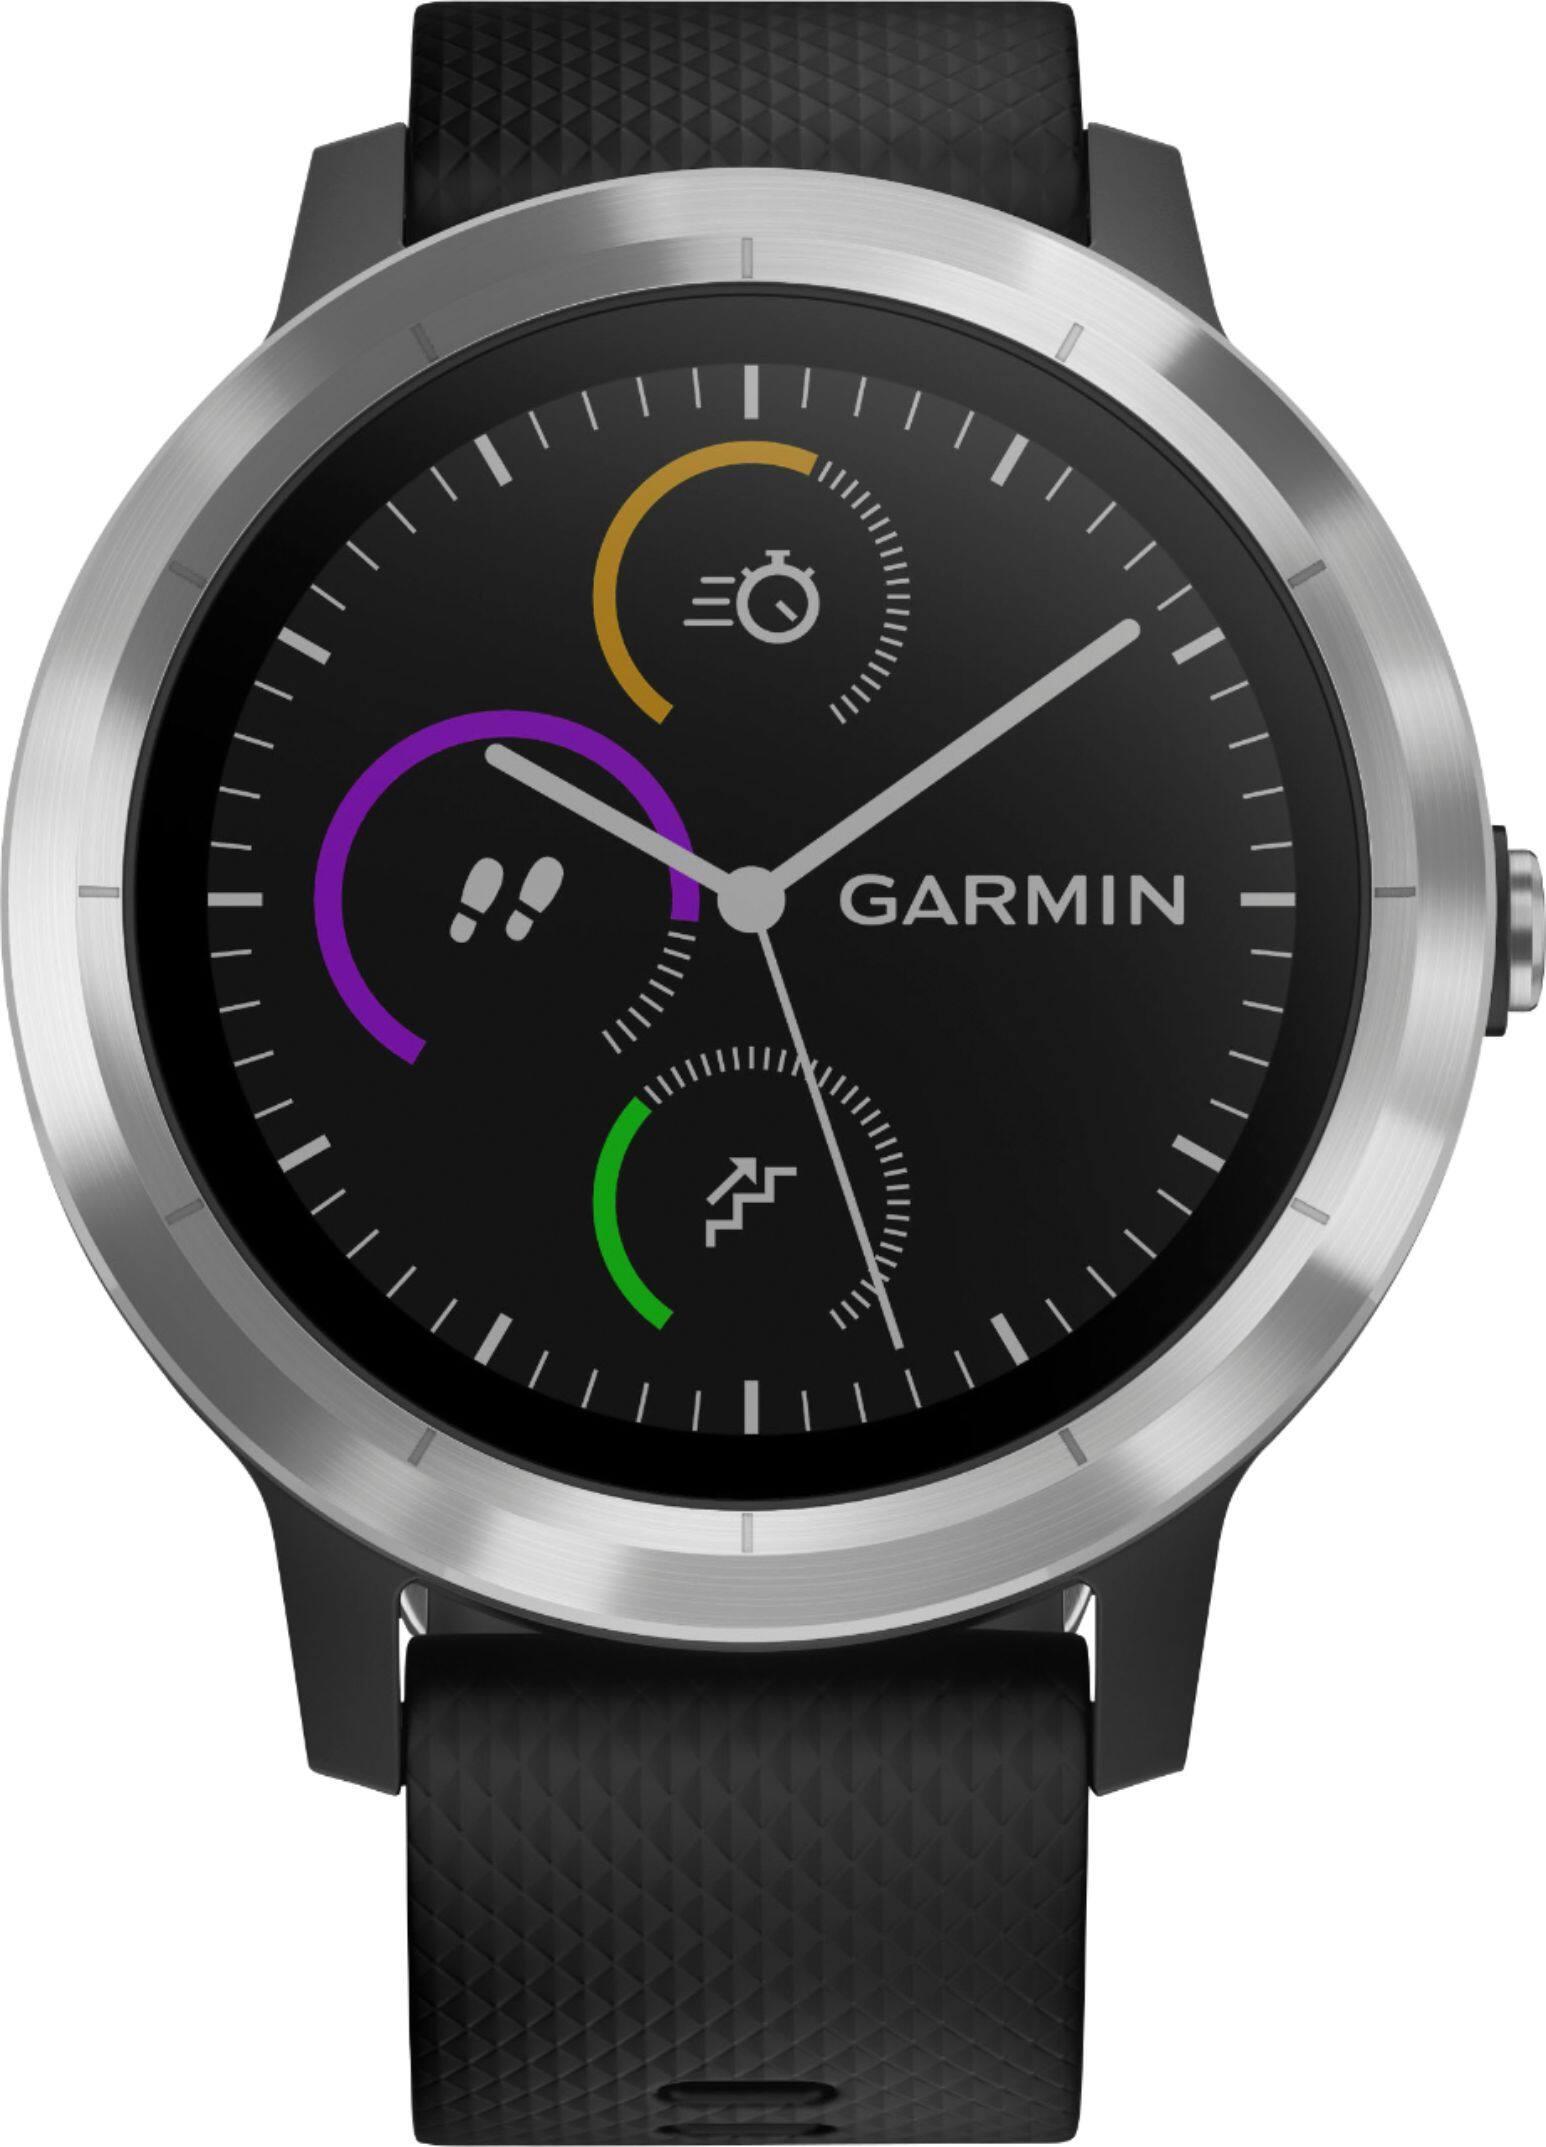 Garmin Vivoactive 3 GPS Smartwatch (Black / Stainless)